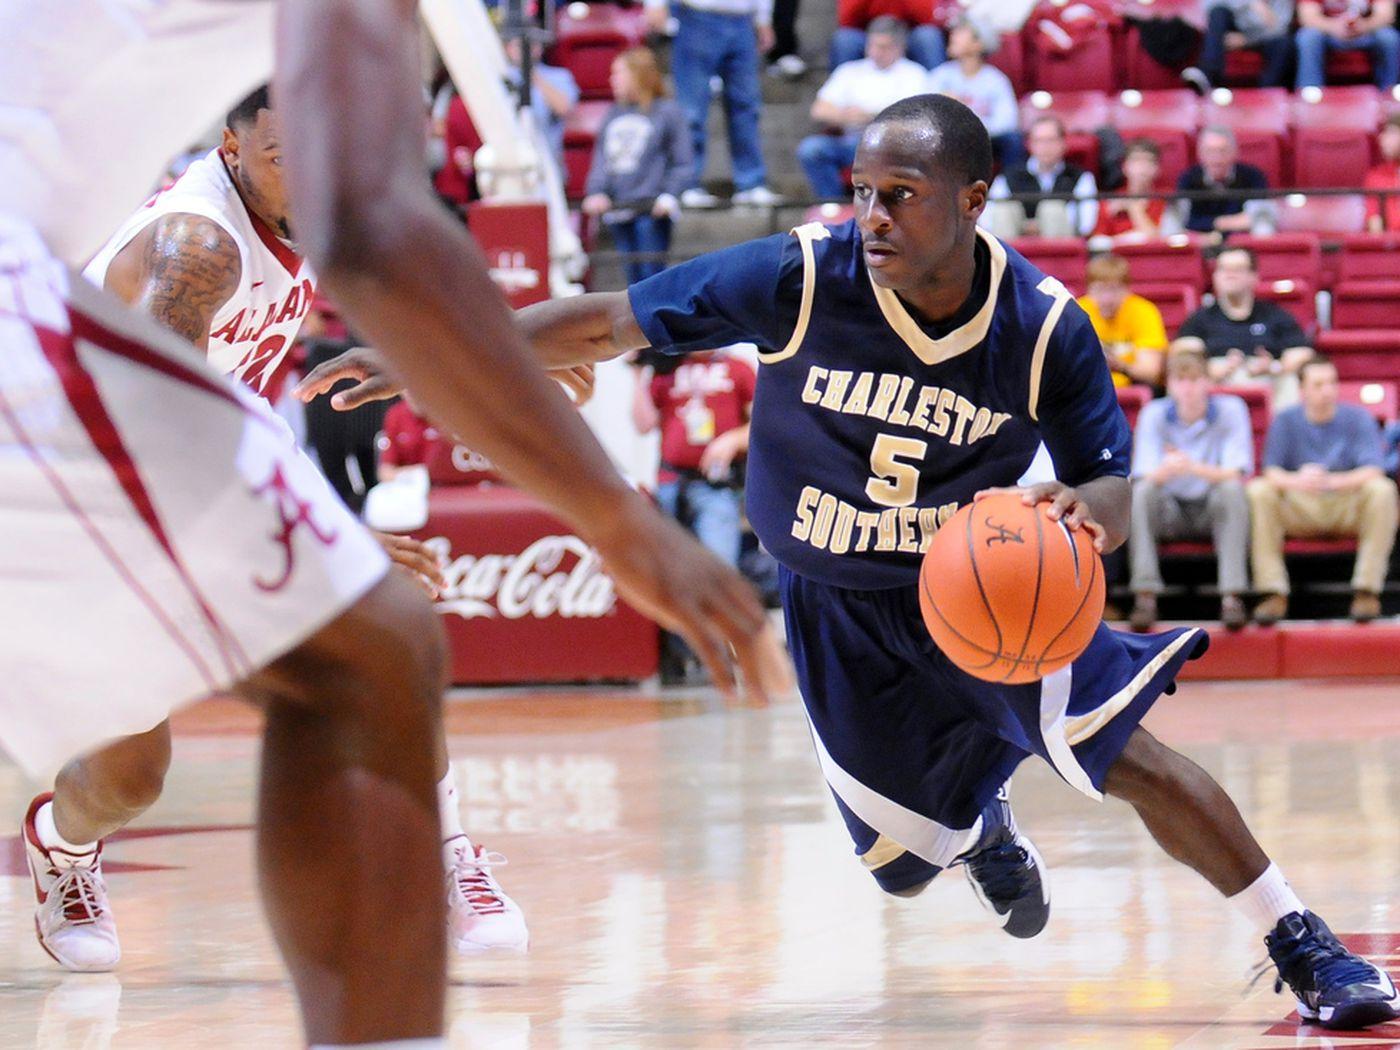 watch Charleston Southern Buccaneers Vs. Gardner-Webb Bulldogs Live